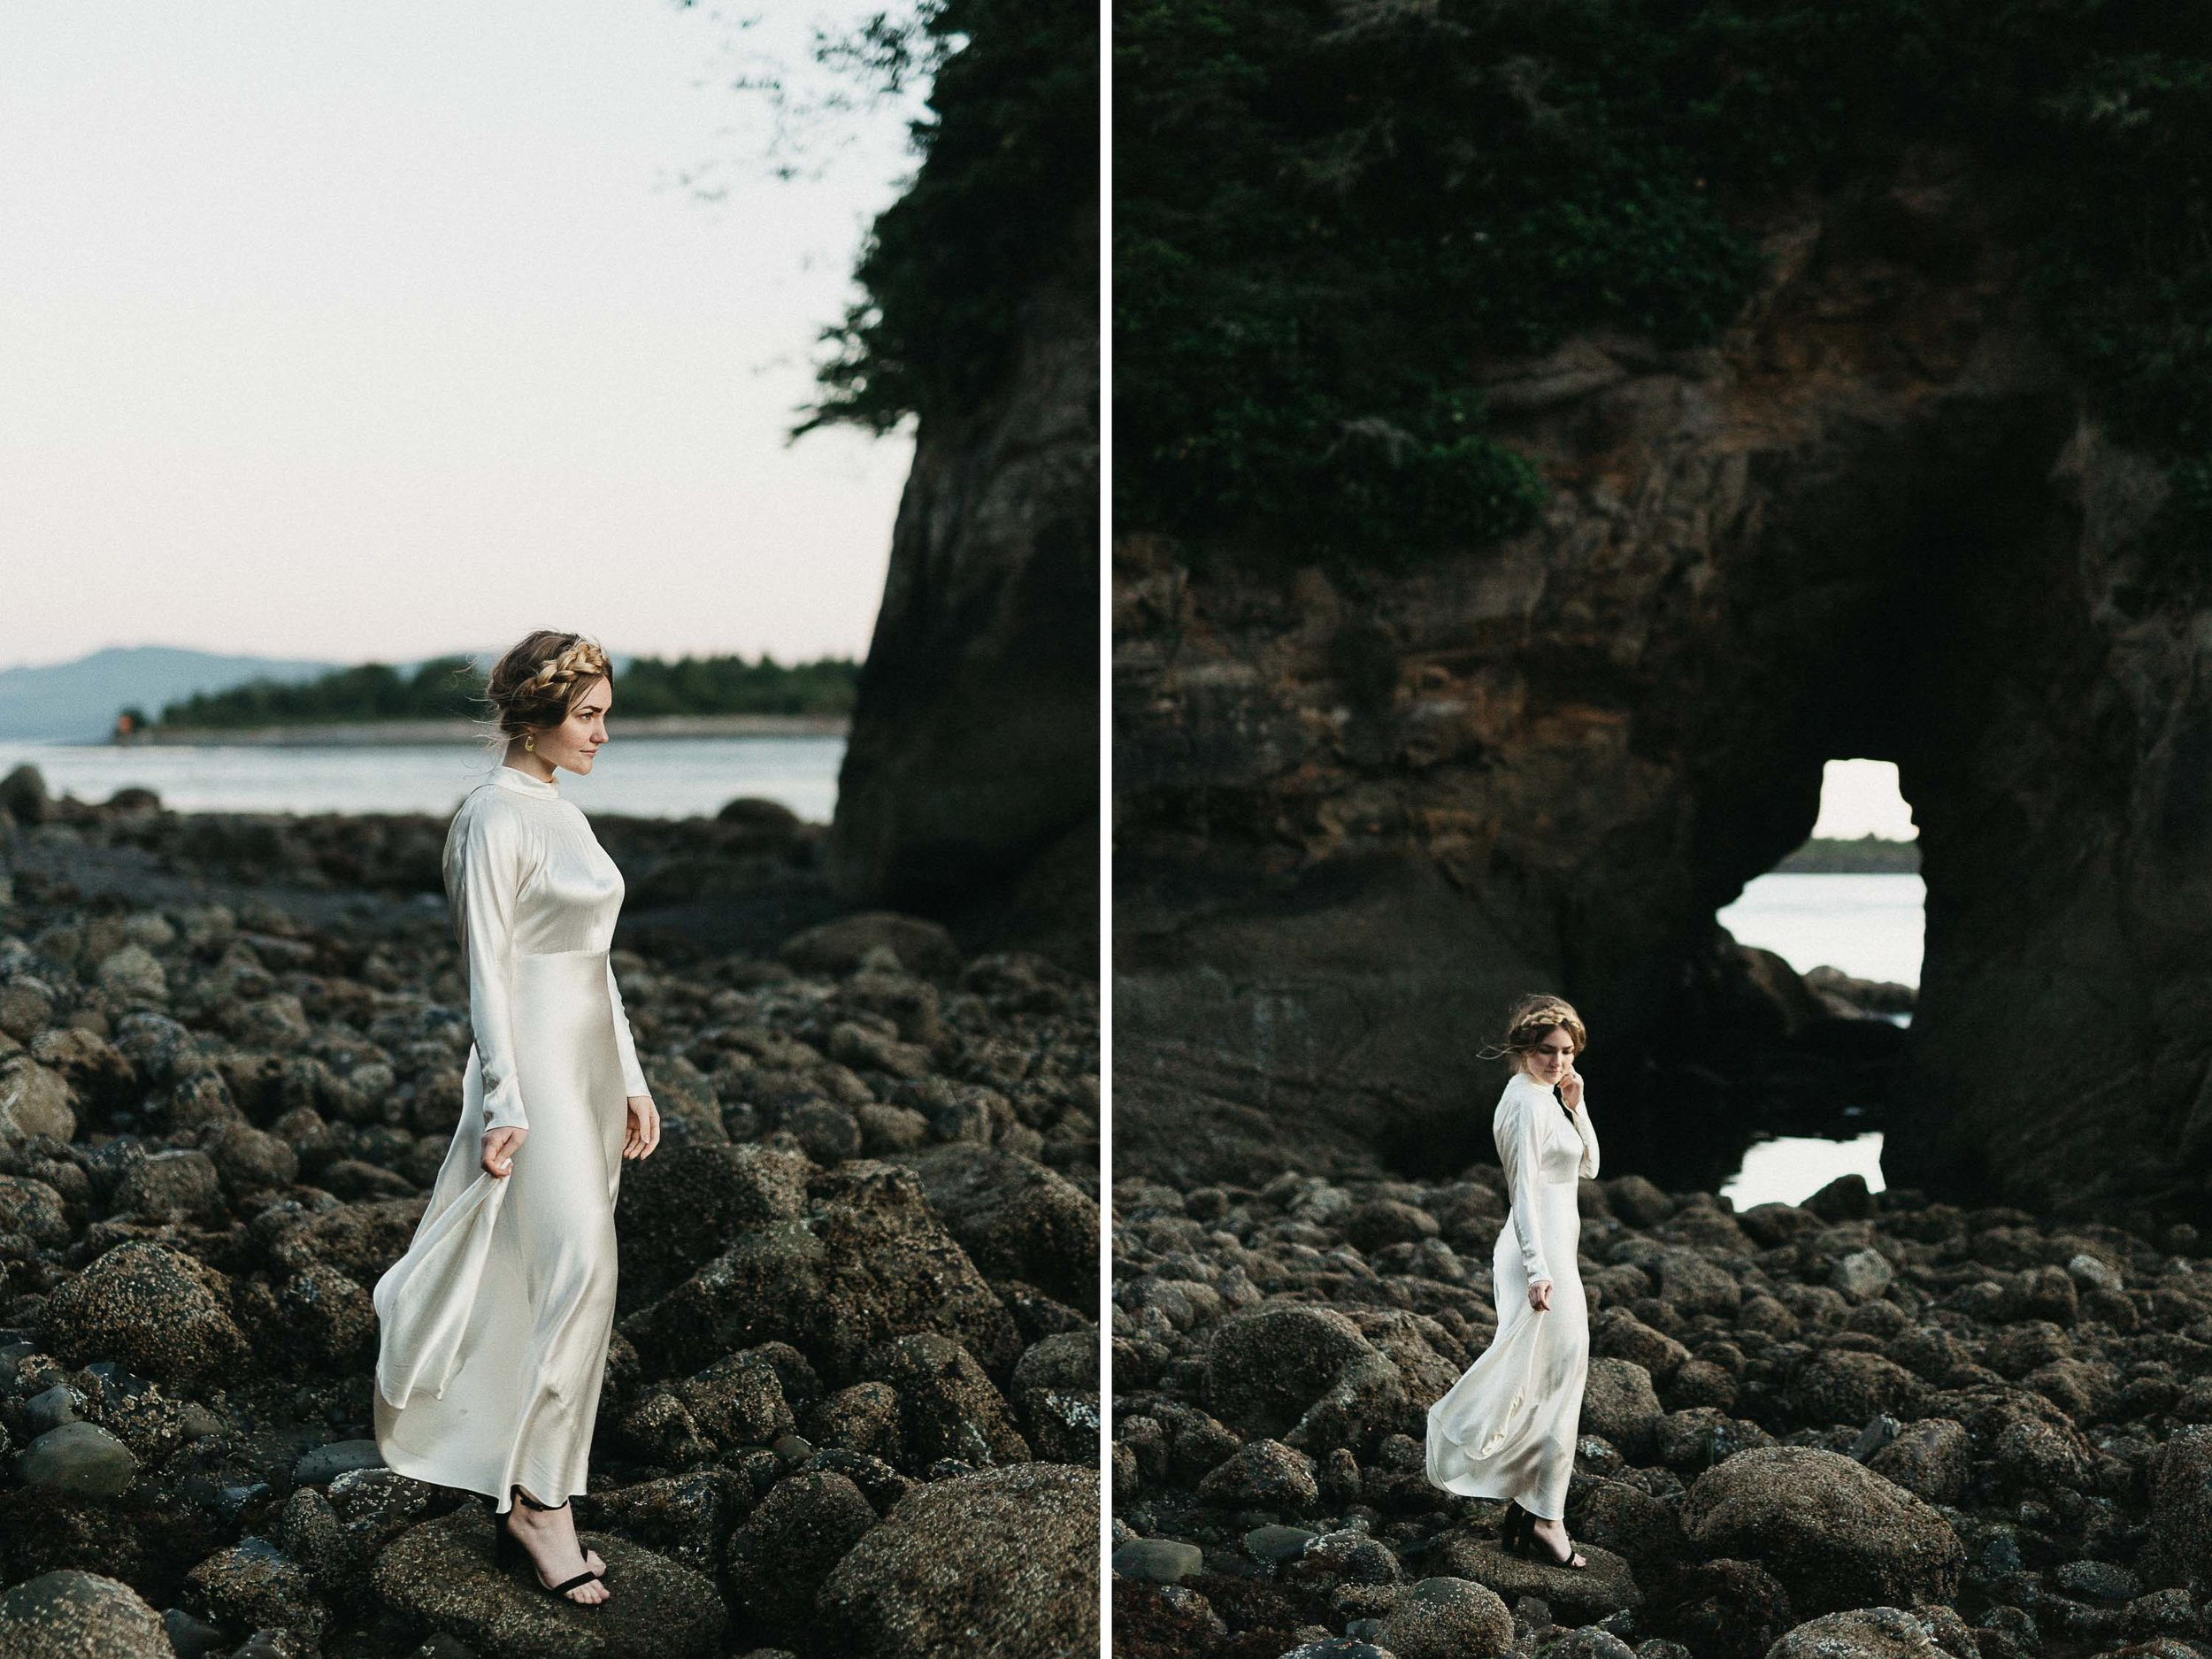 Oregon-Wedding-Photographer-06.jpg